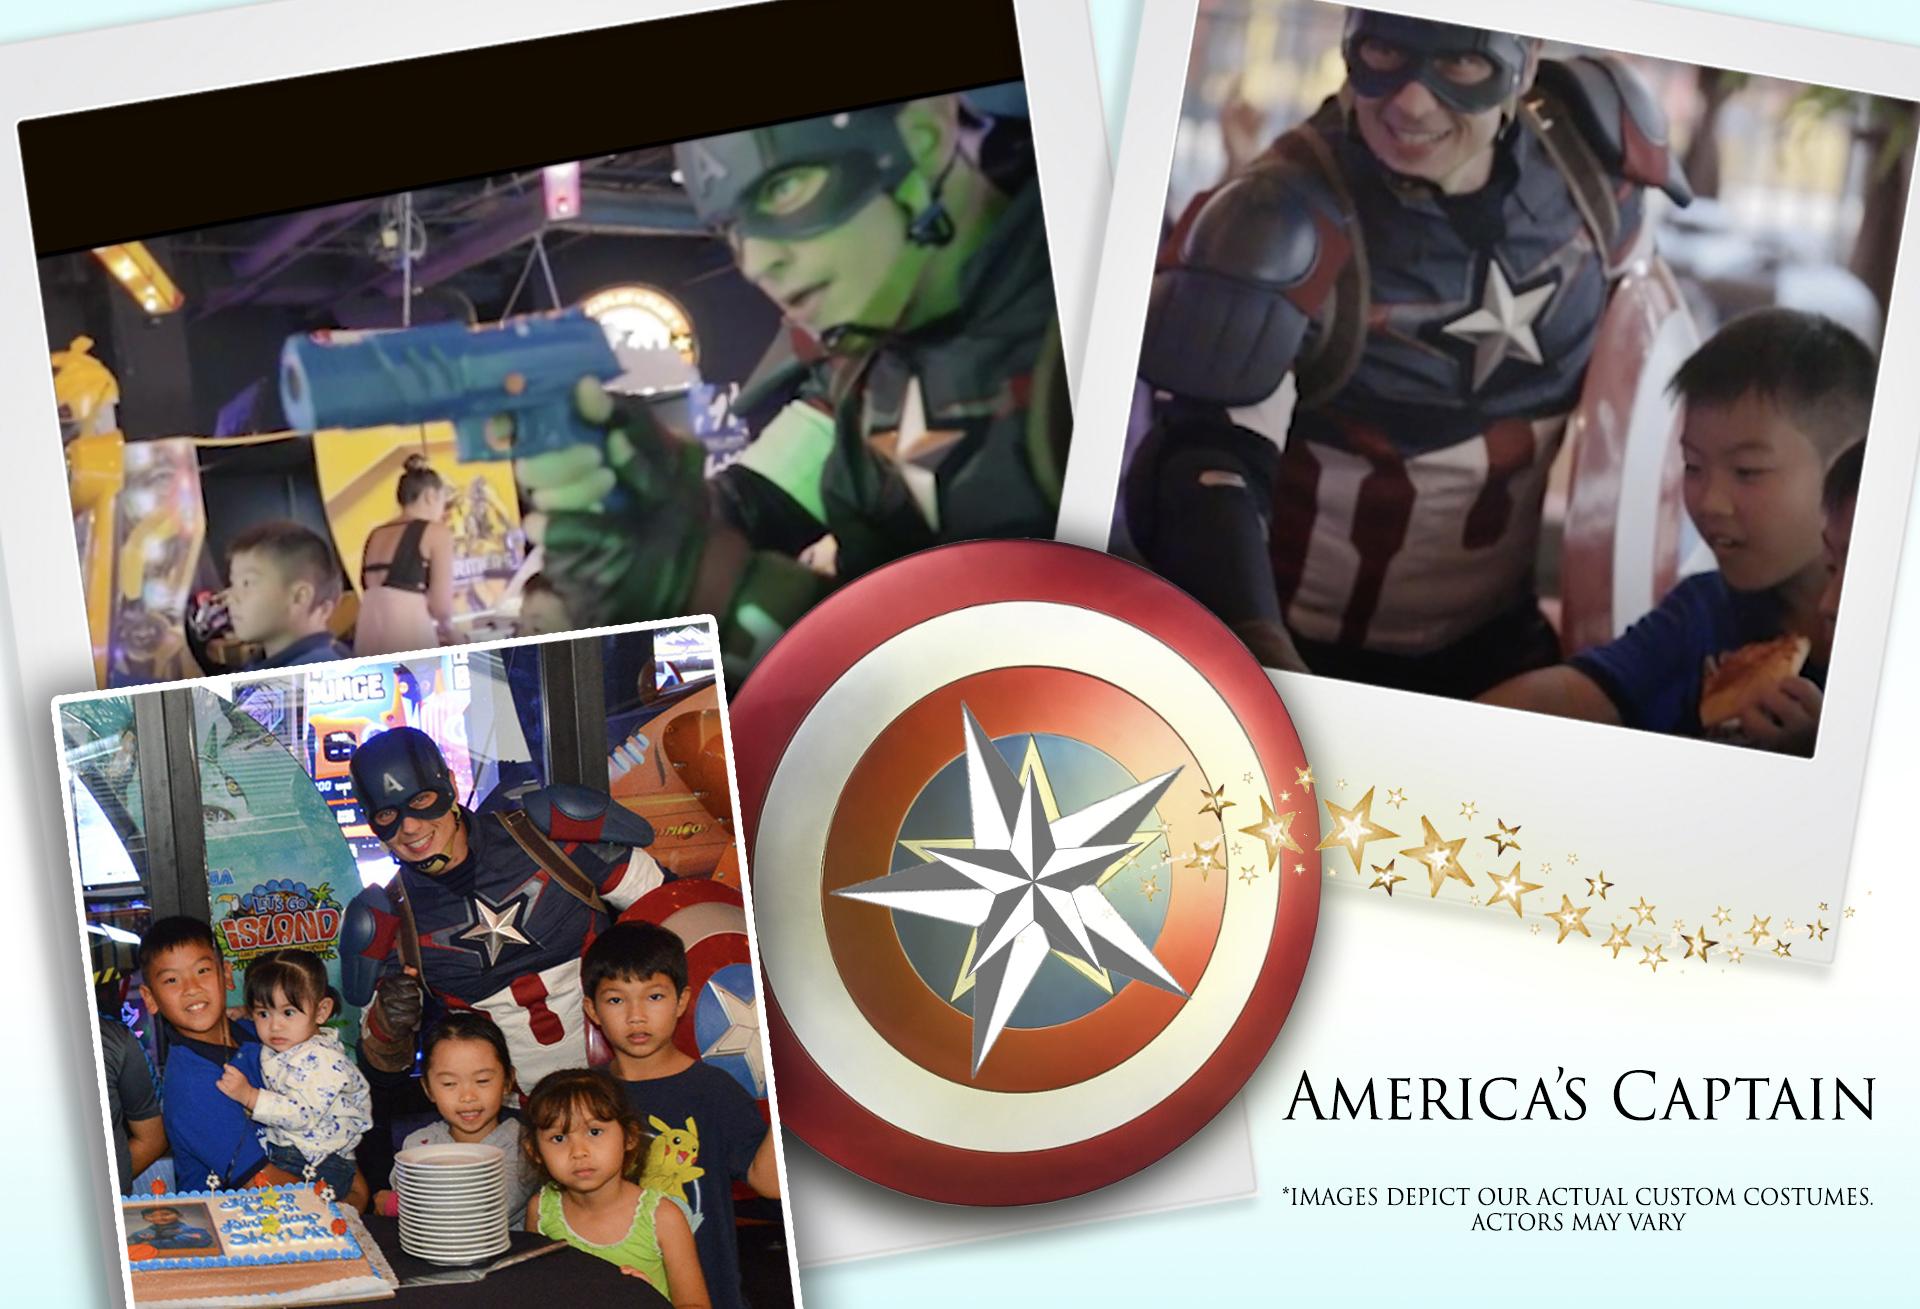 America's Captain